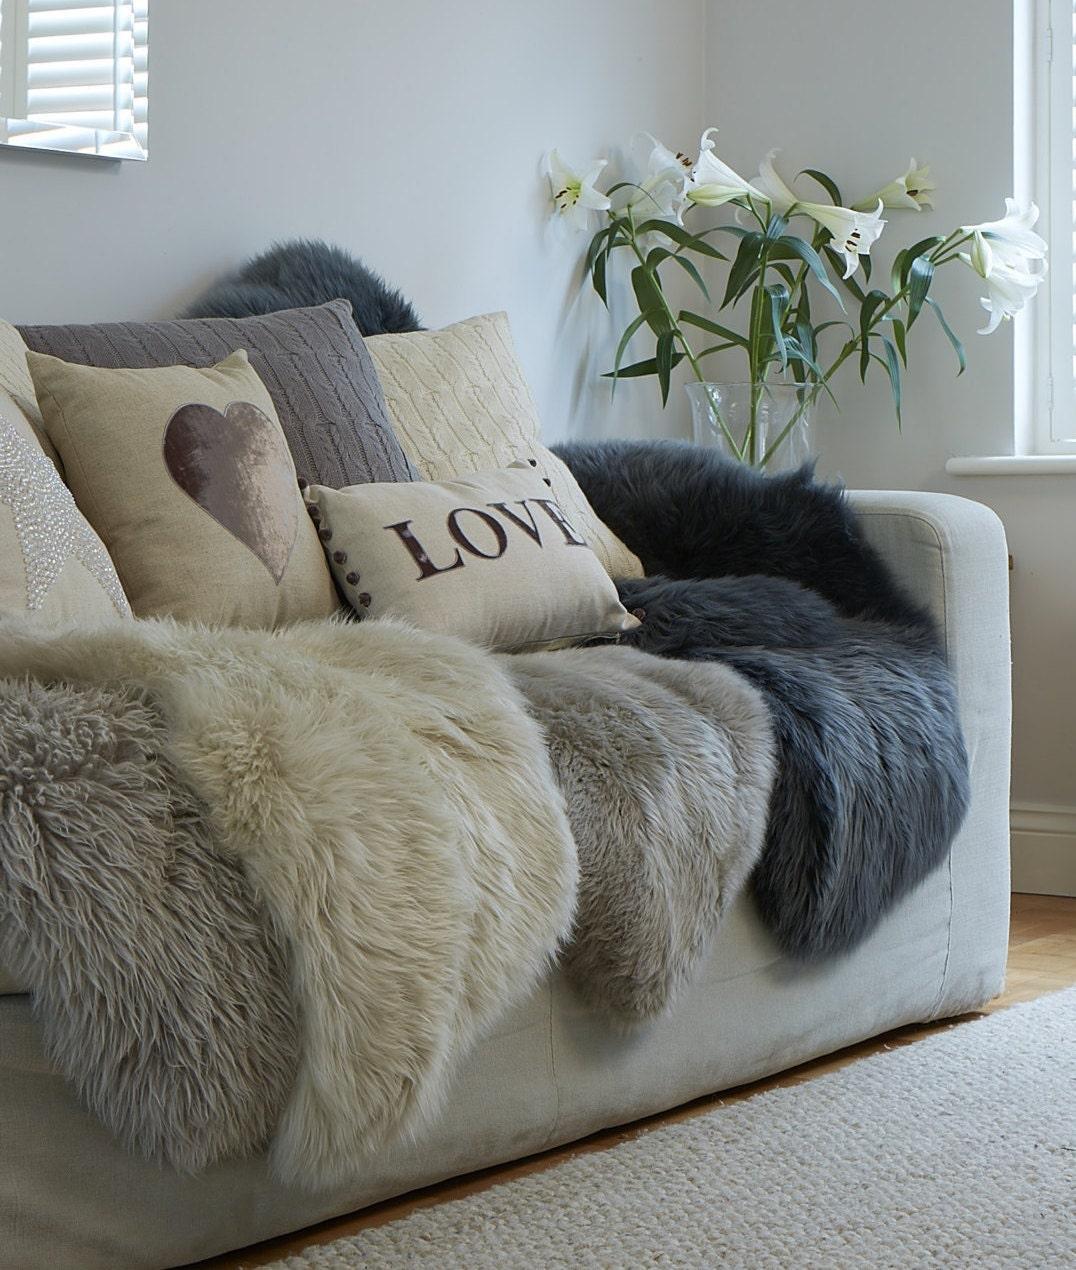 Sheepskin Rug Look: STUNNING Neutral Sheepskin Rugs In Super Soft Thick